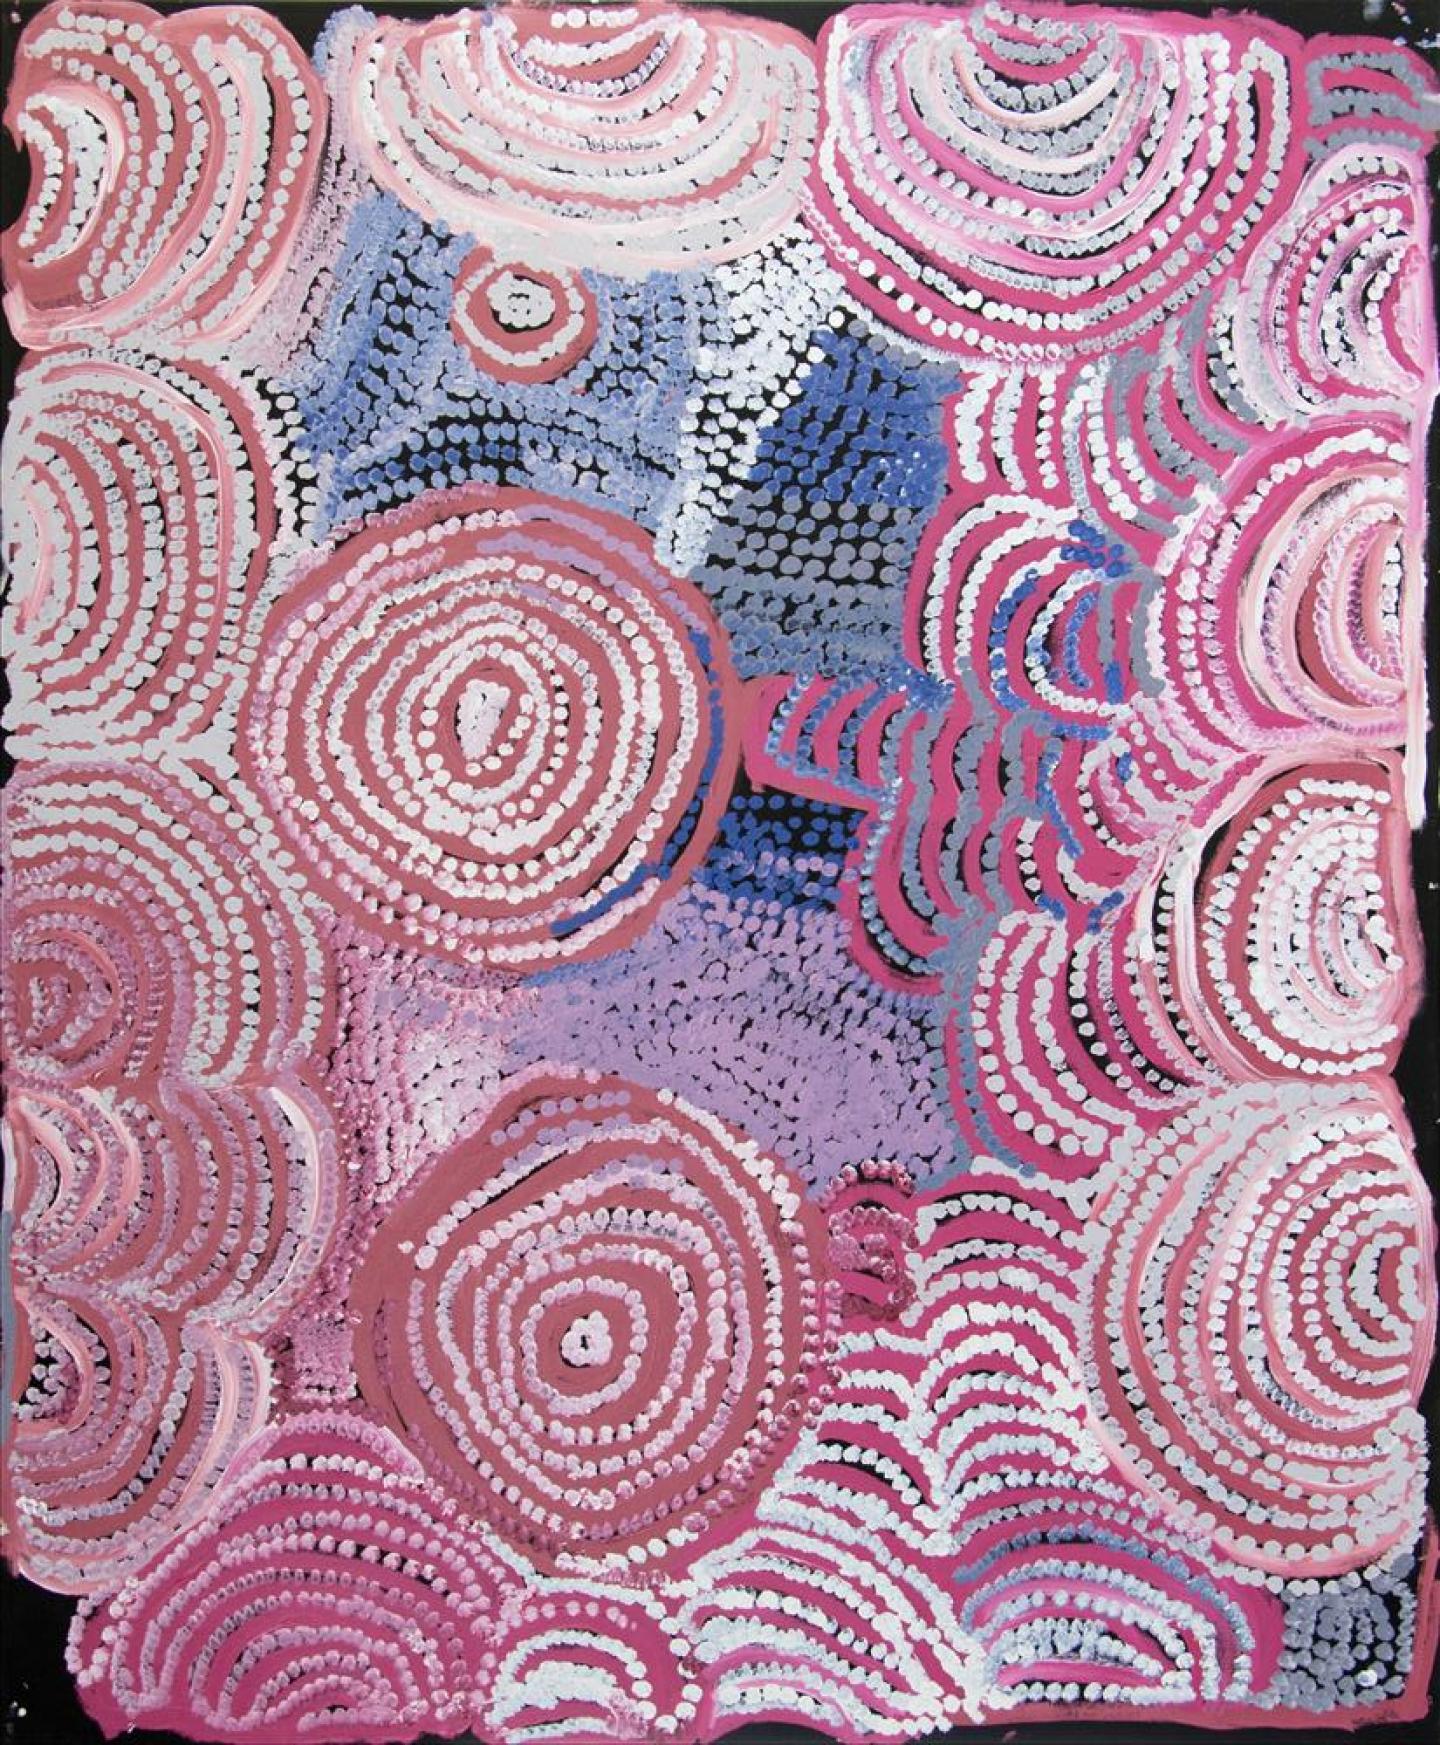 Nyarapayi Giles, Aboriginal art, Tjarlirli Art